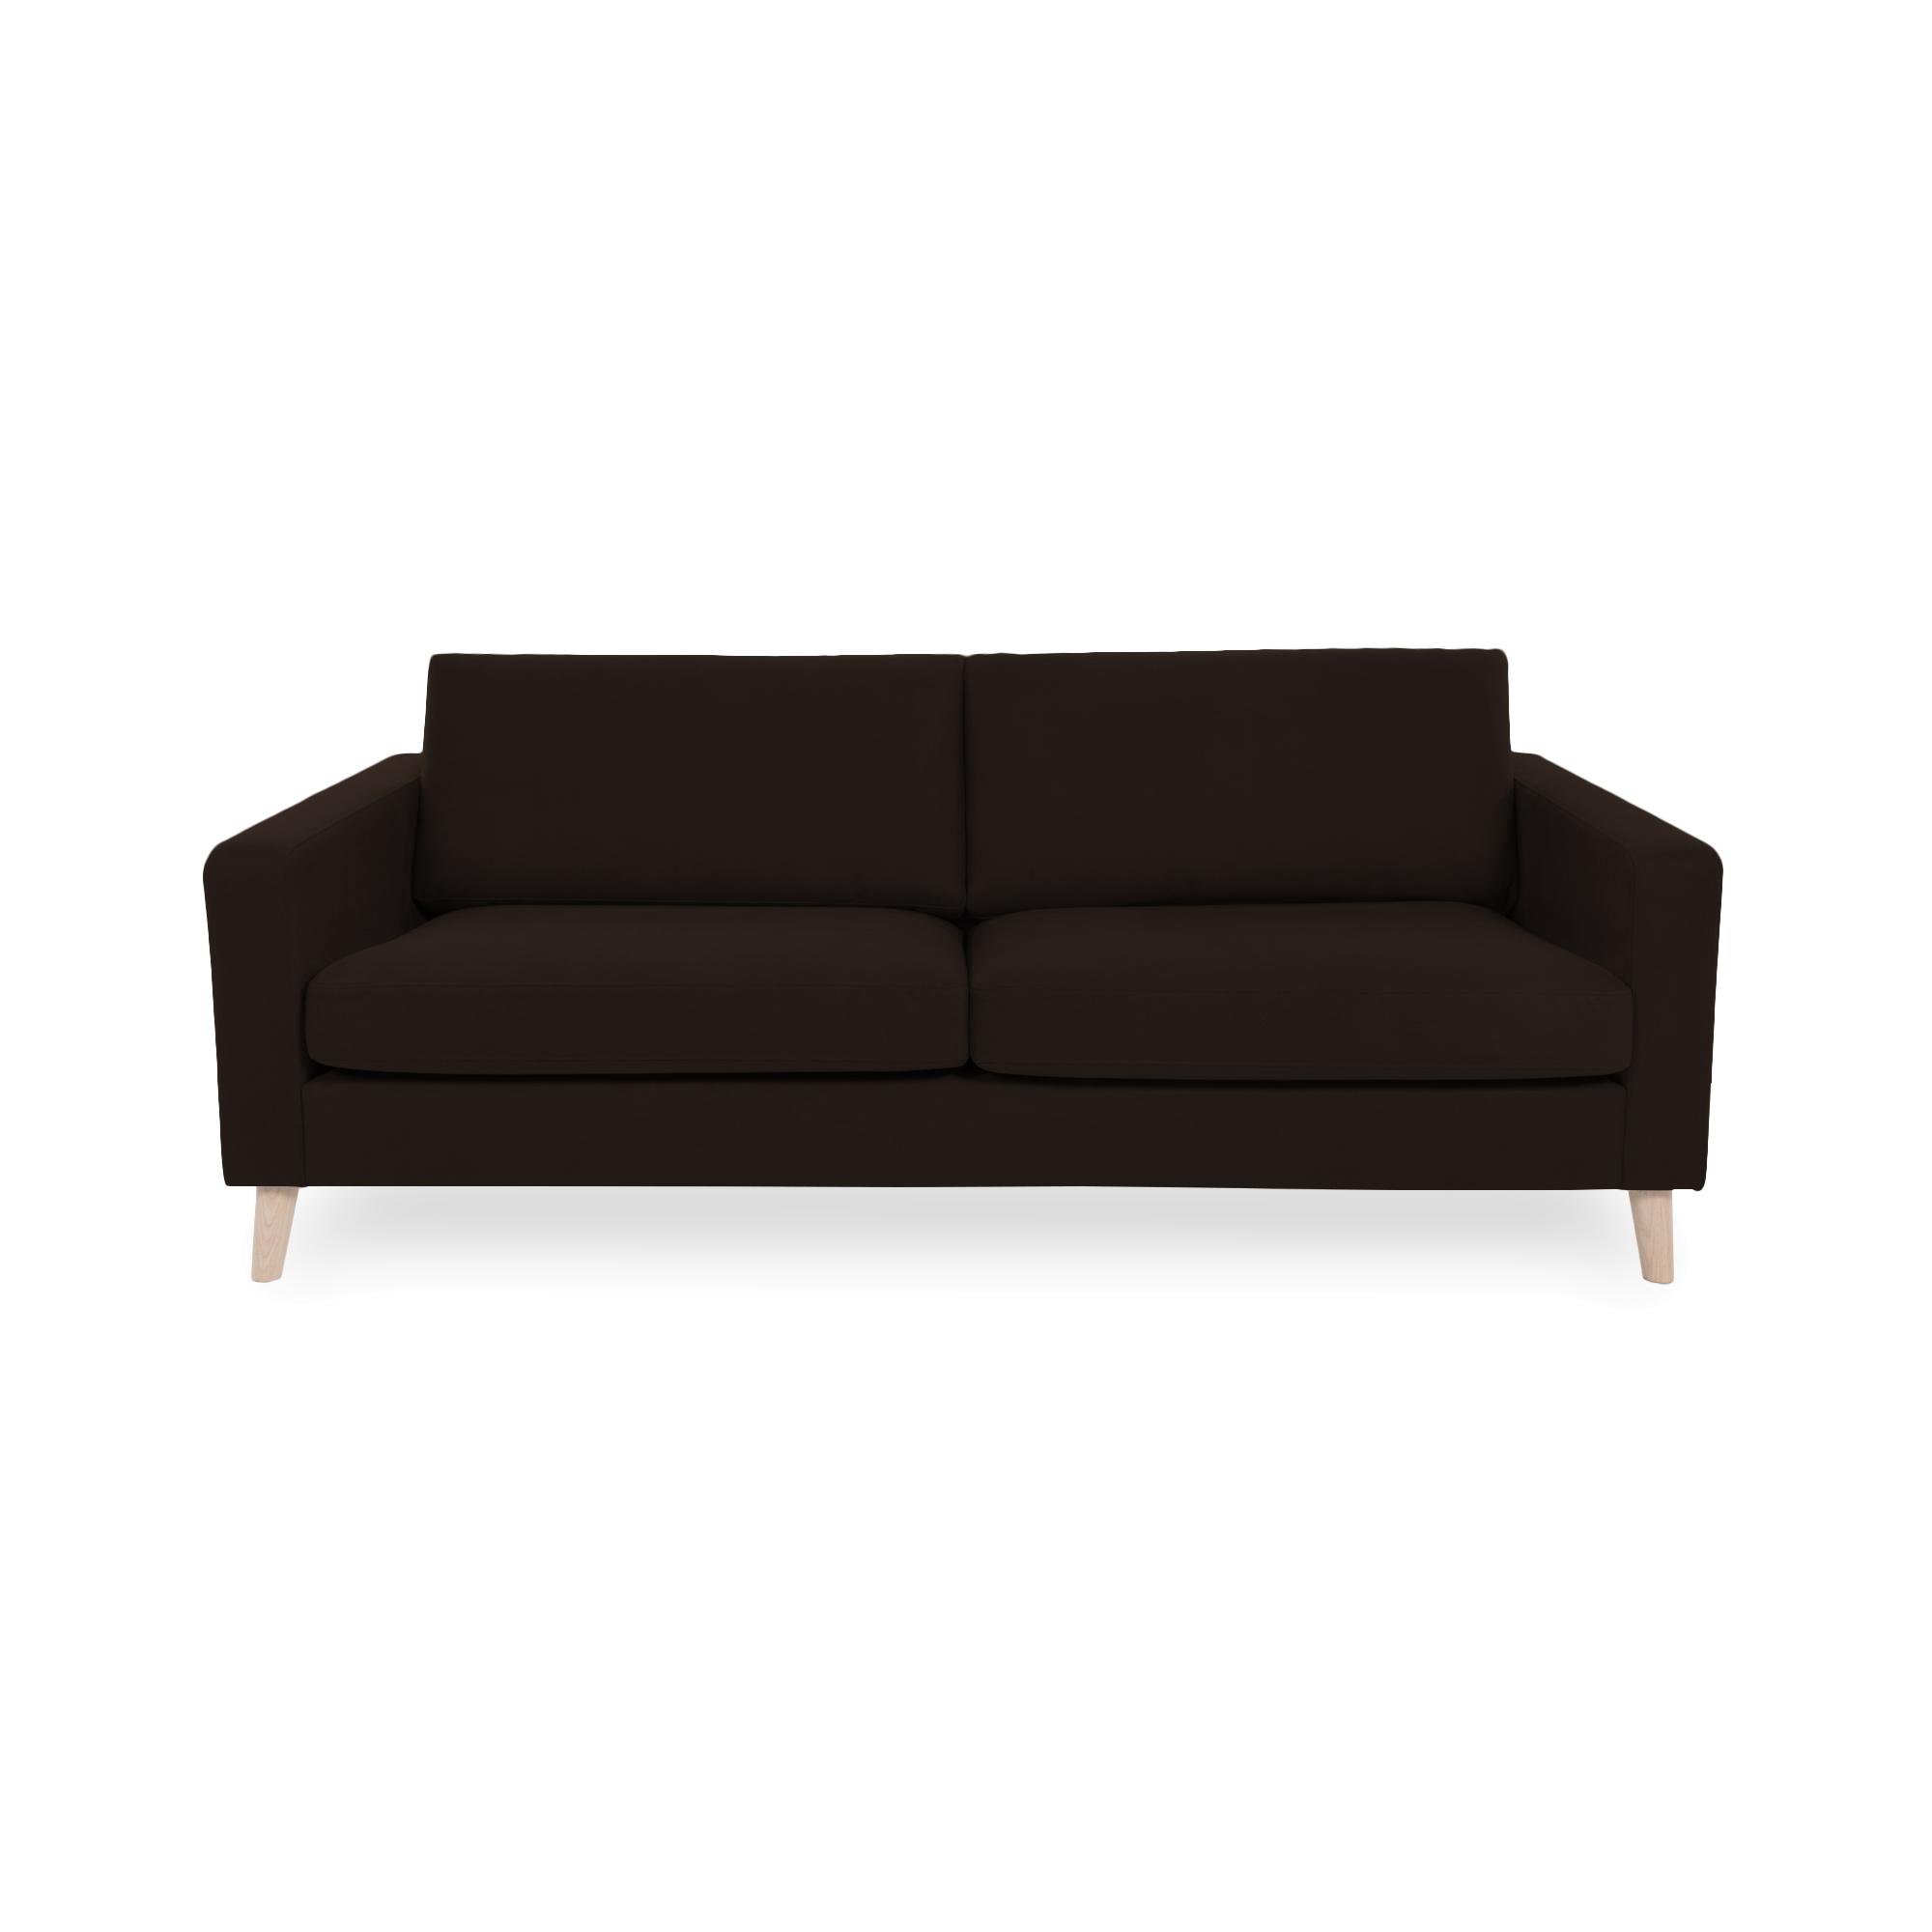 Canapea Fixa 3 locuri Tom Brown/Natural